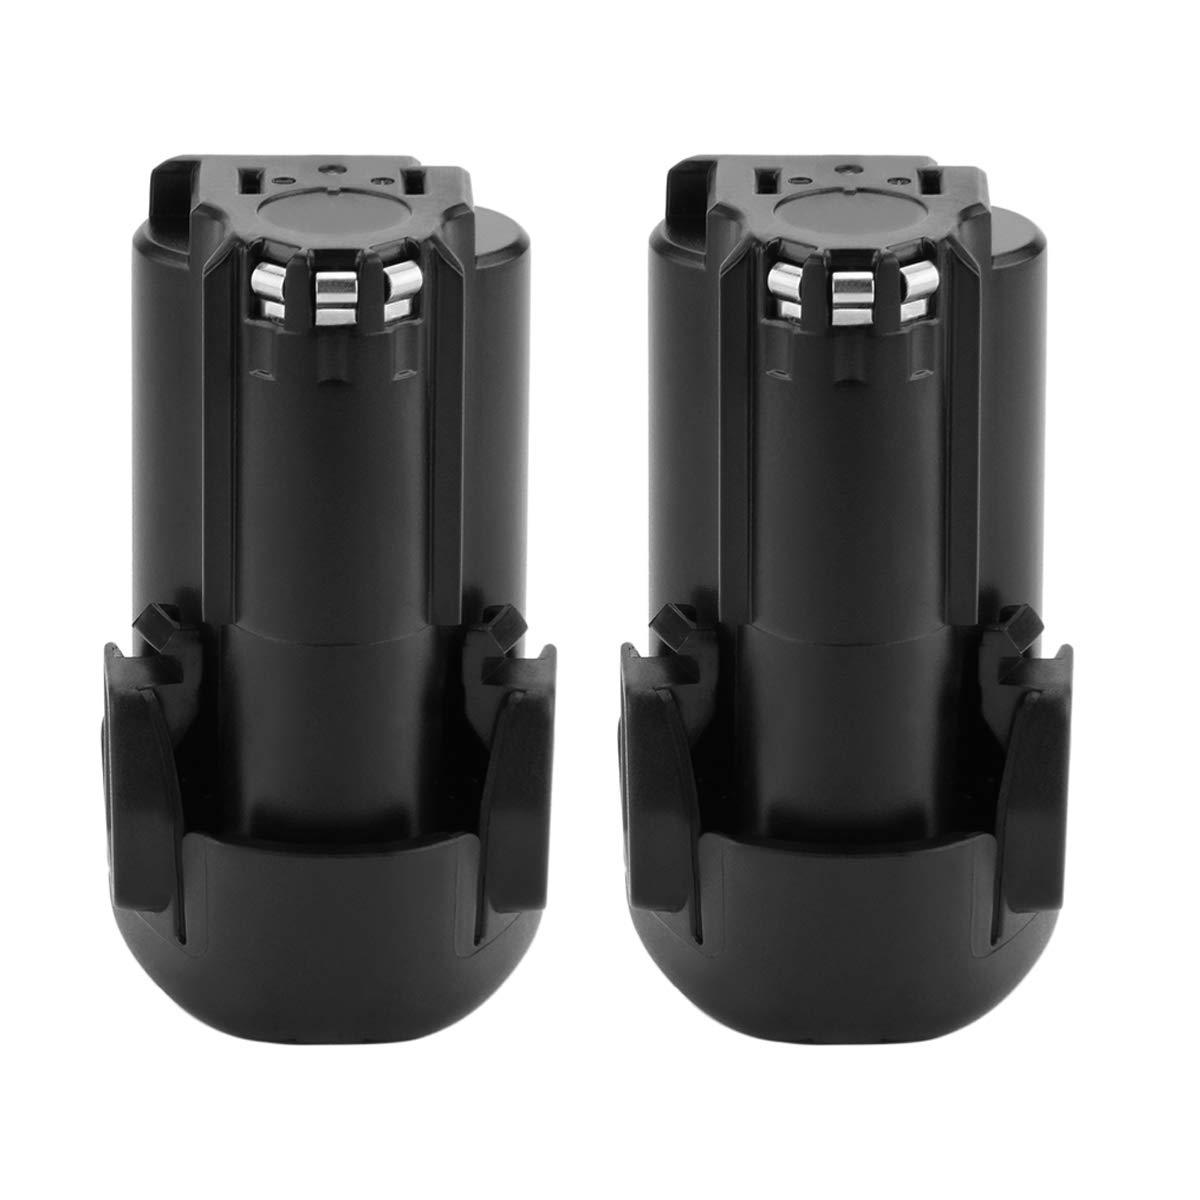 2 Baterias para Black And Decker BL1110, BL1310, BL1510